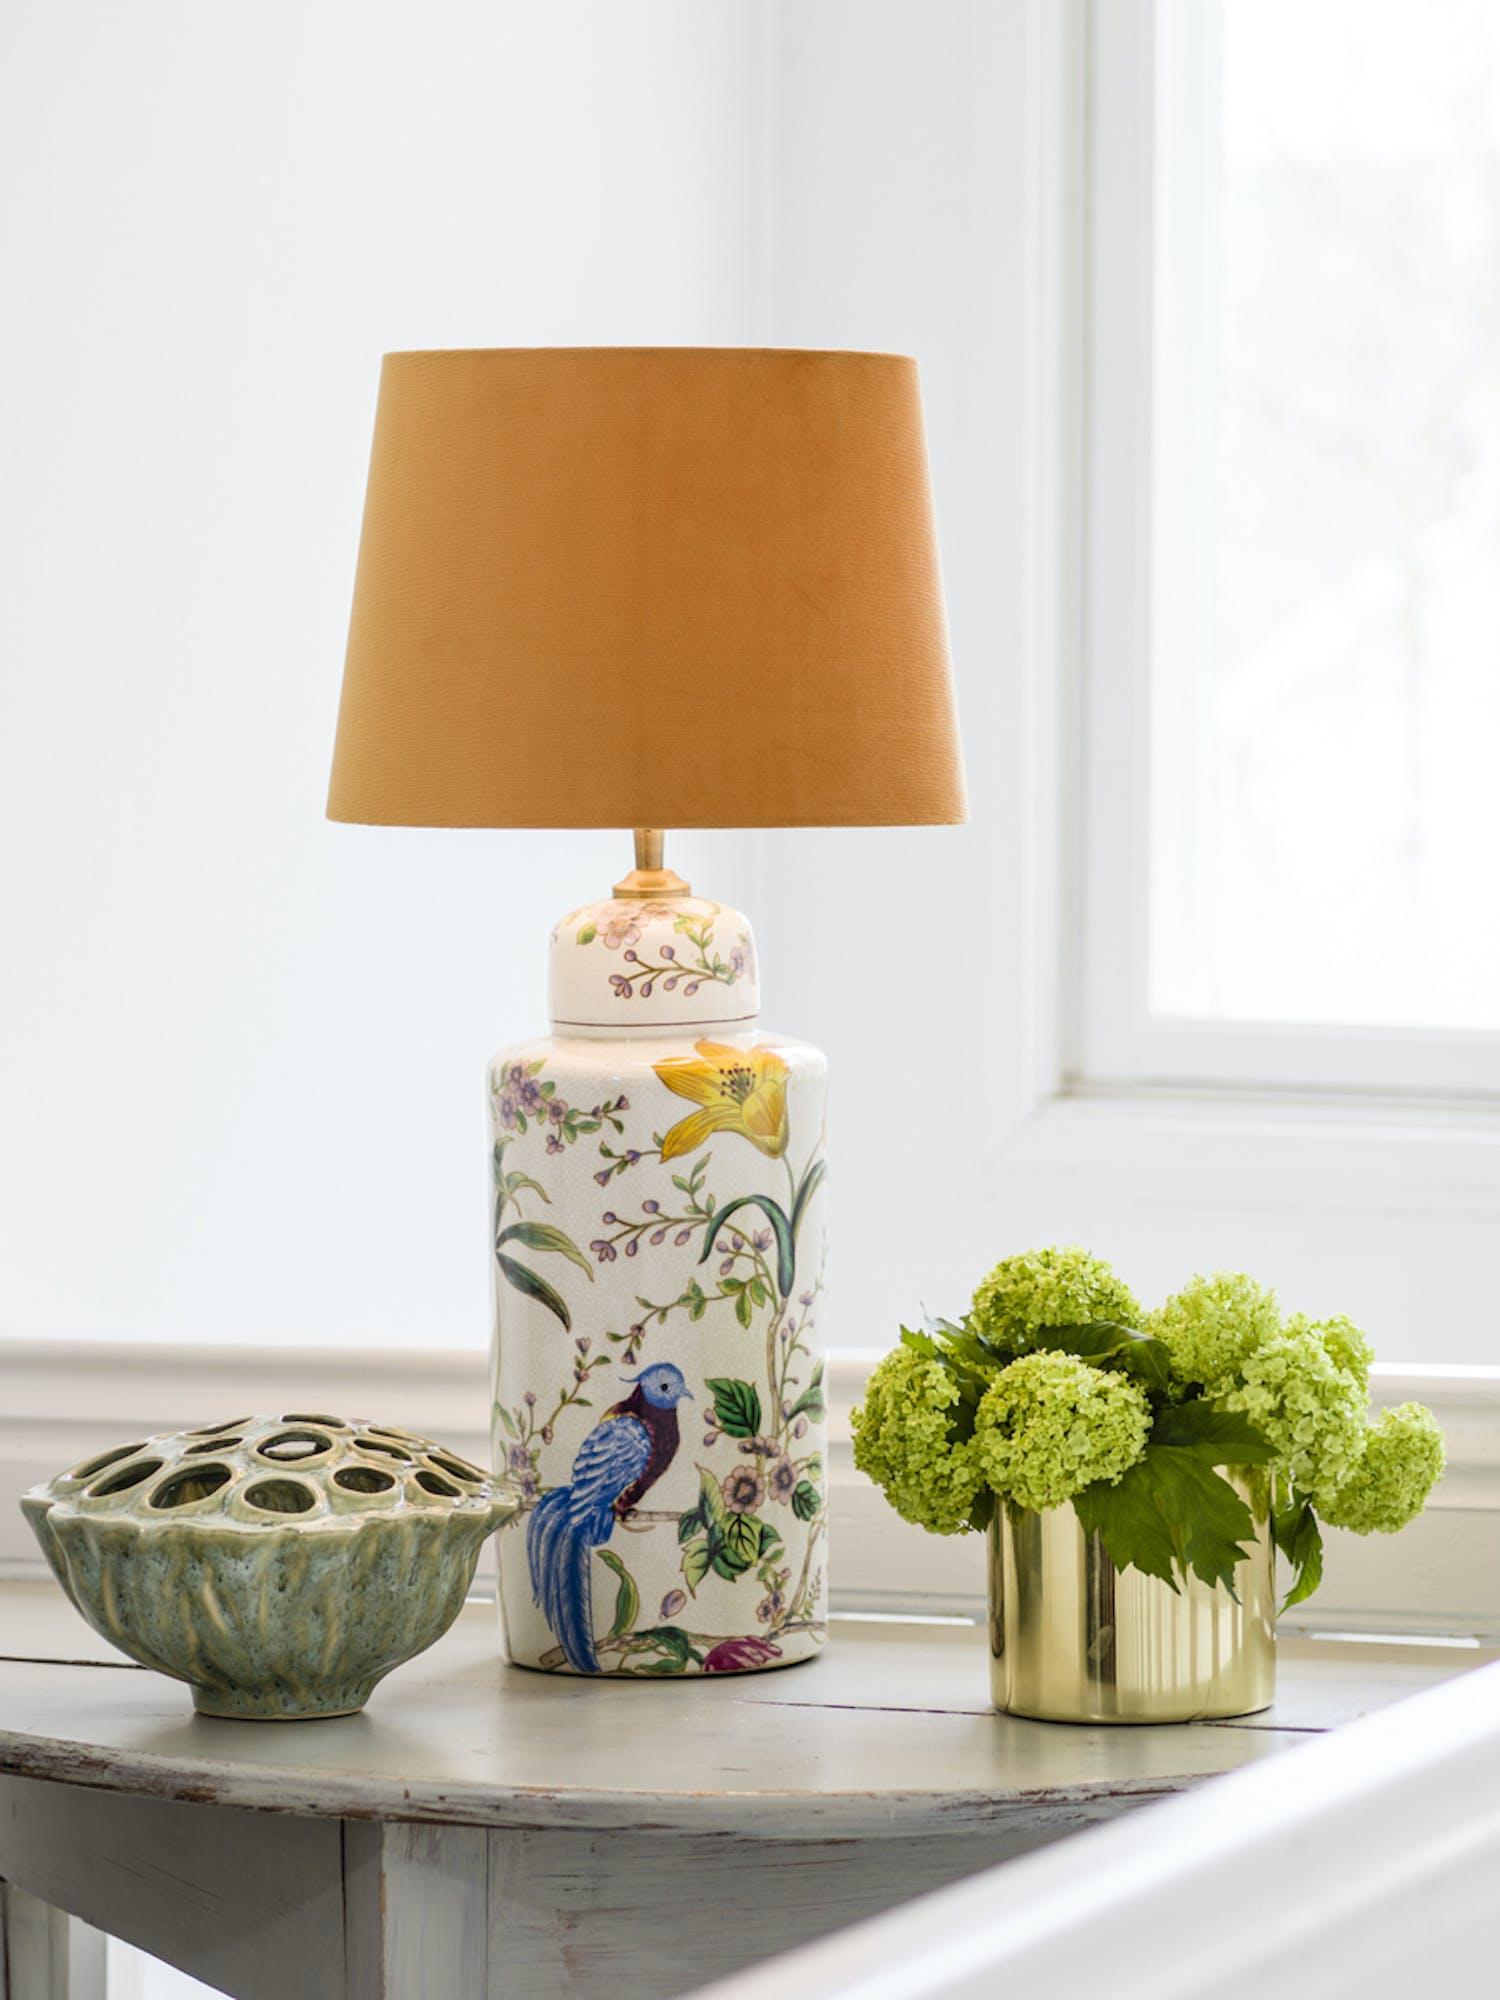 PR Home lampa med orange lampskärm